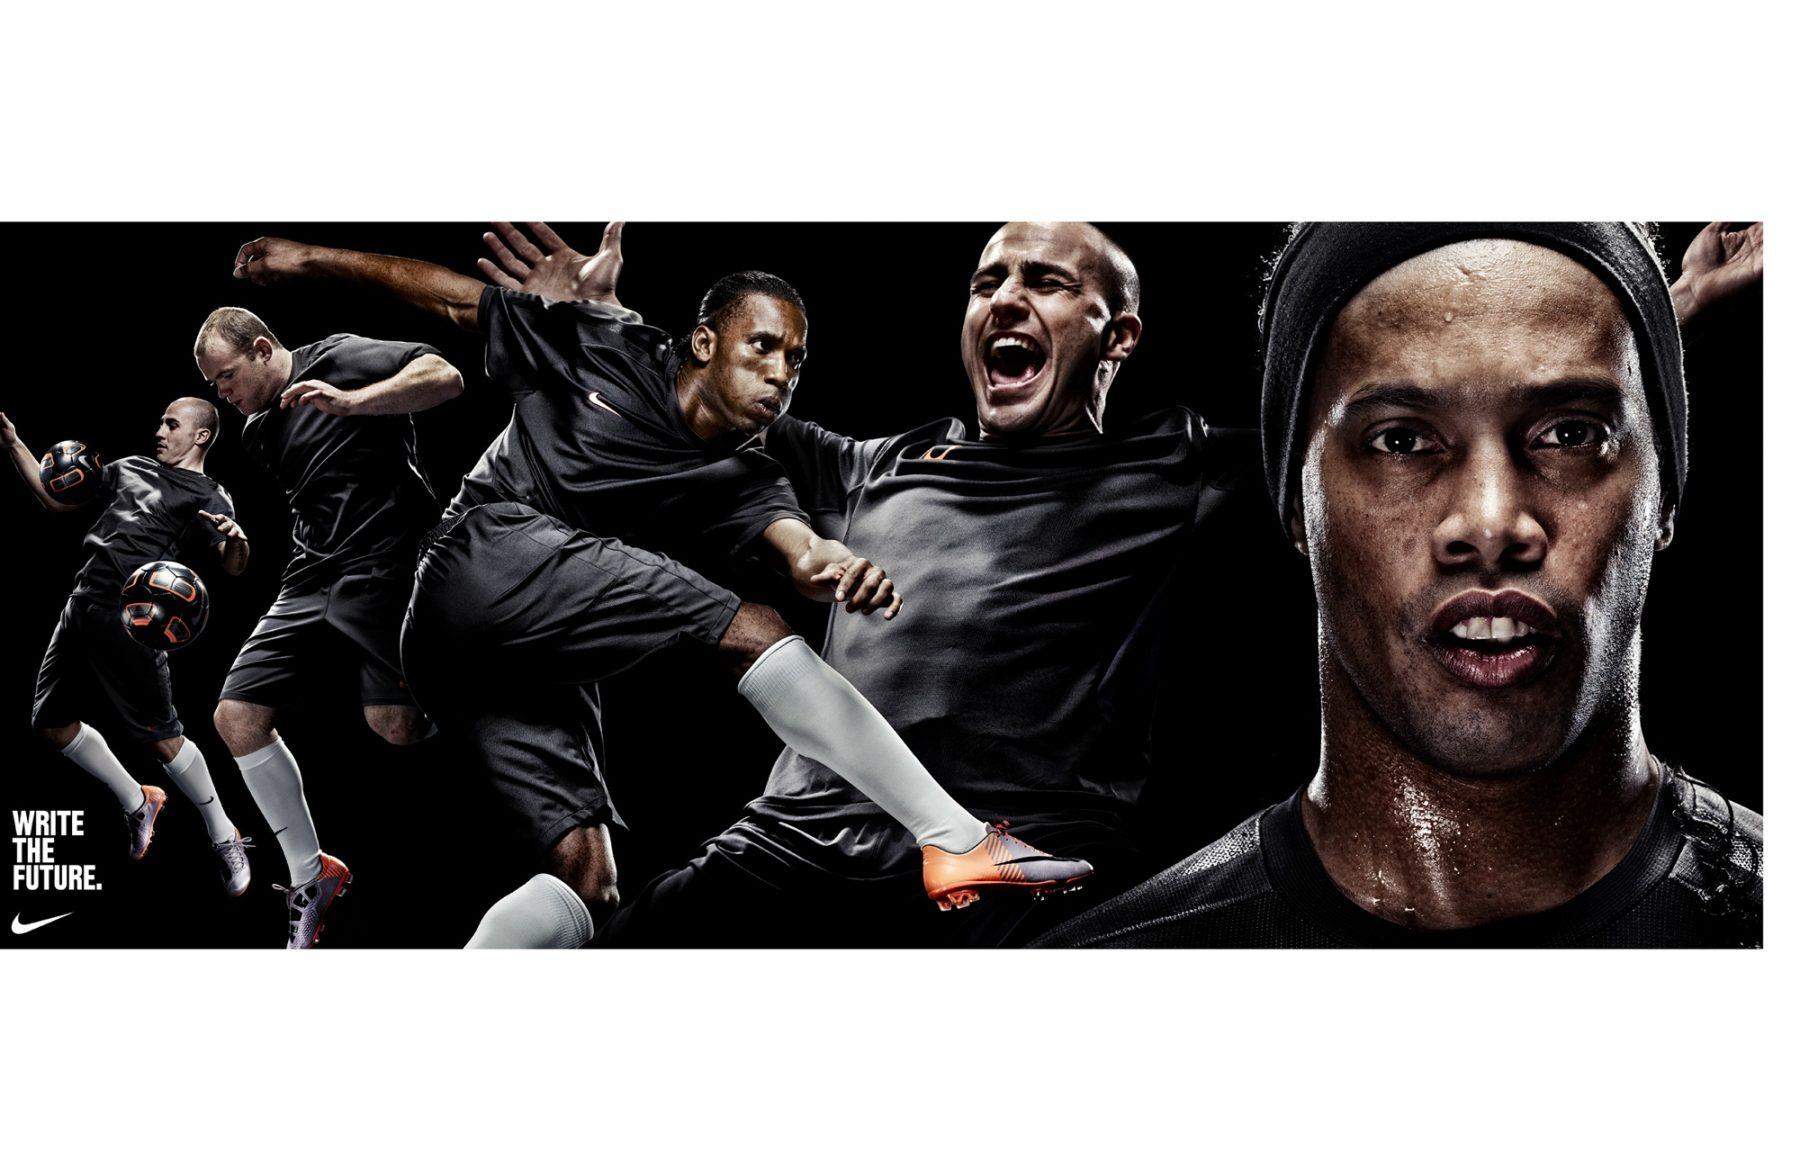 Nike Elite - 3 of 3